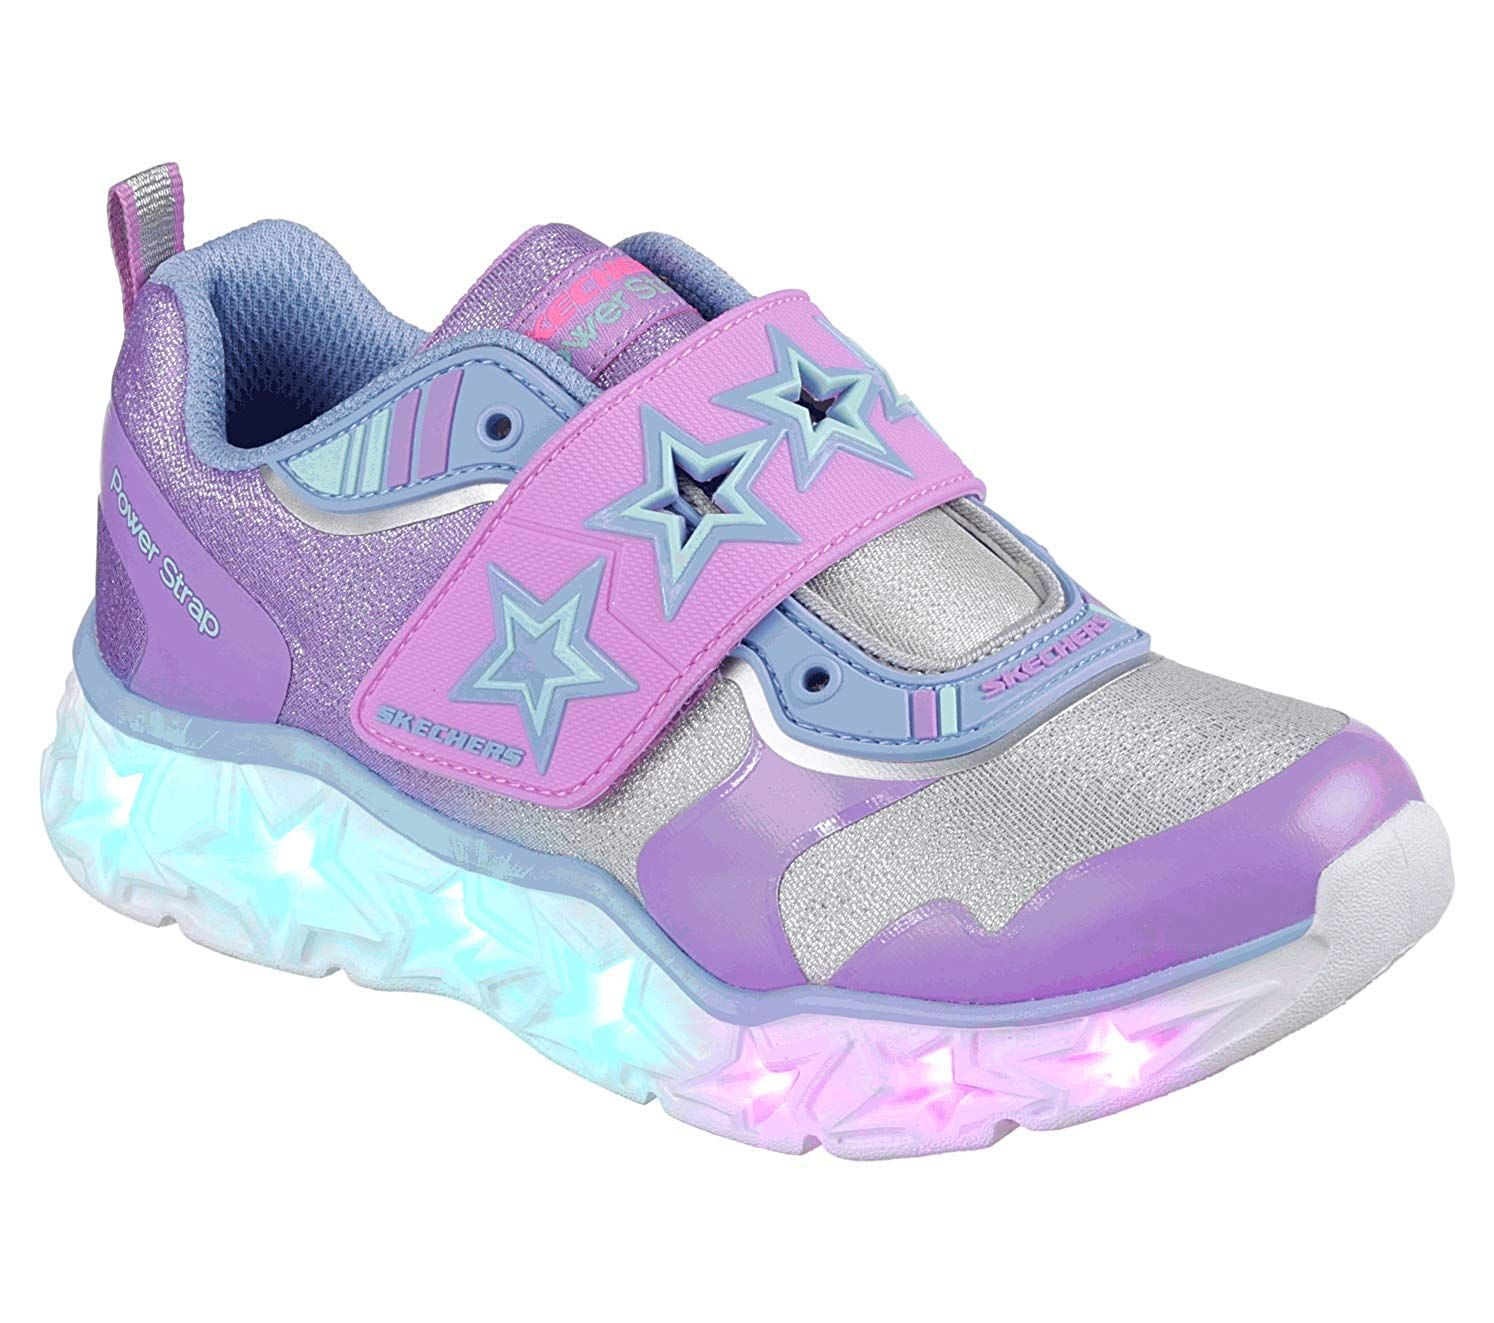 Skechers Kids' Galaxy Lights Cosmic Kick Sneaker Check